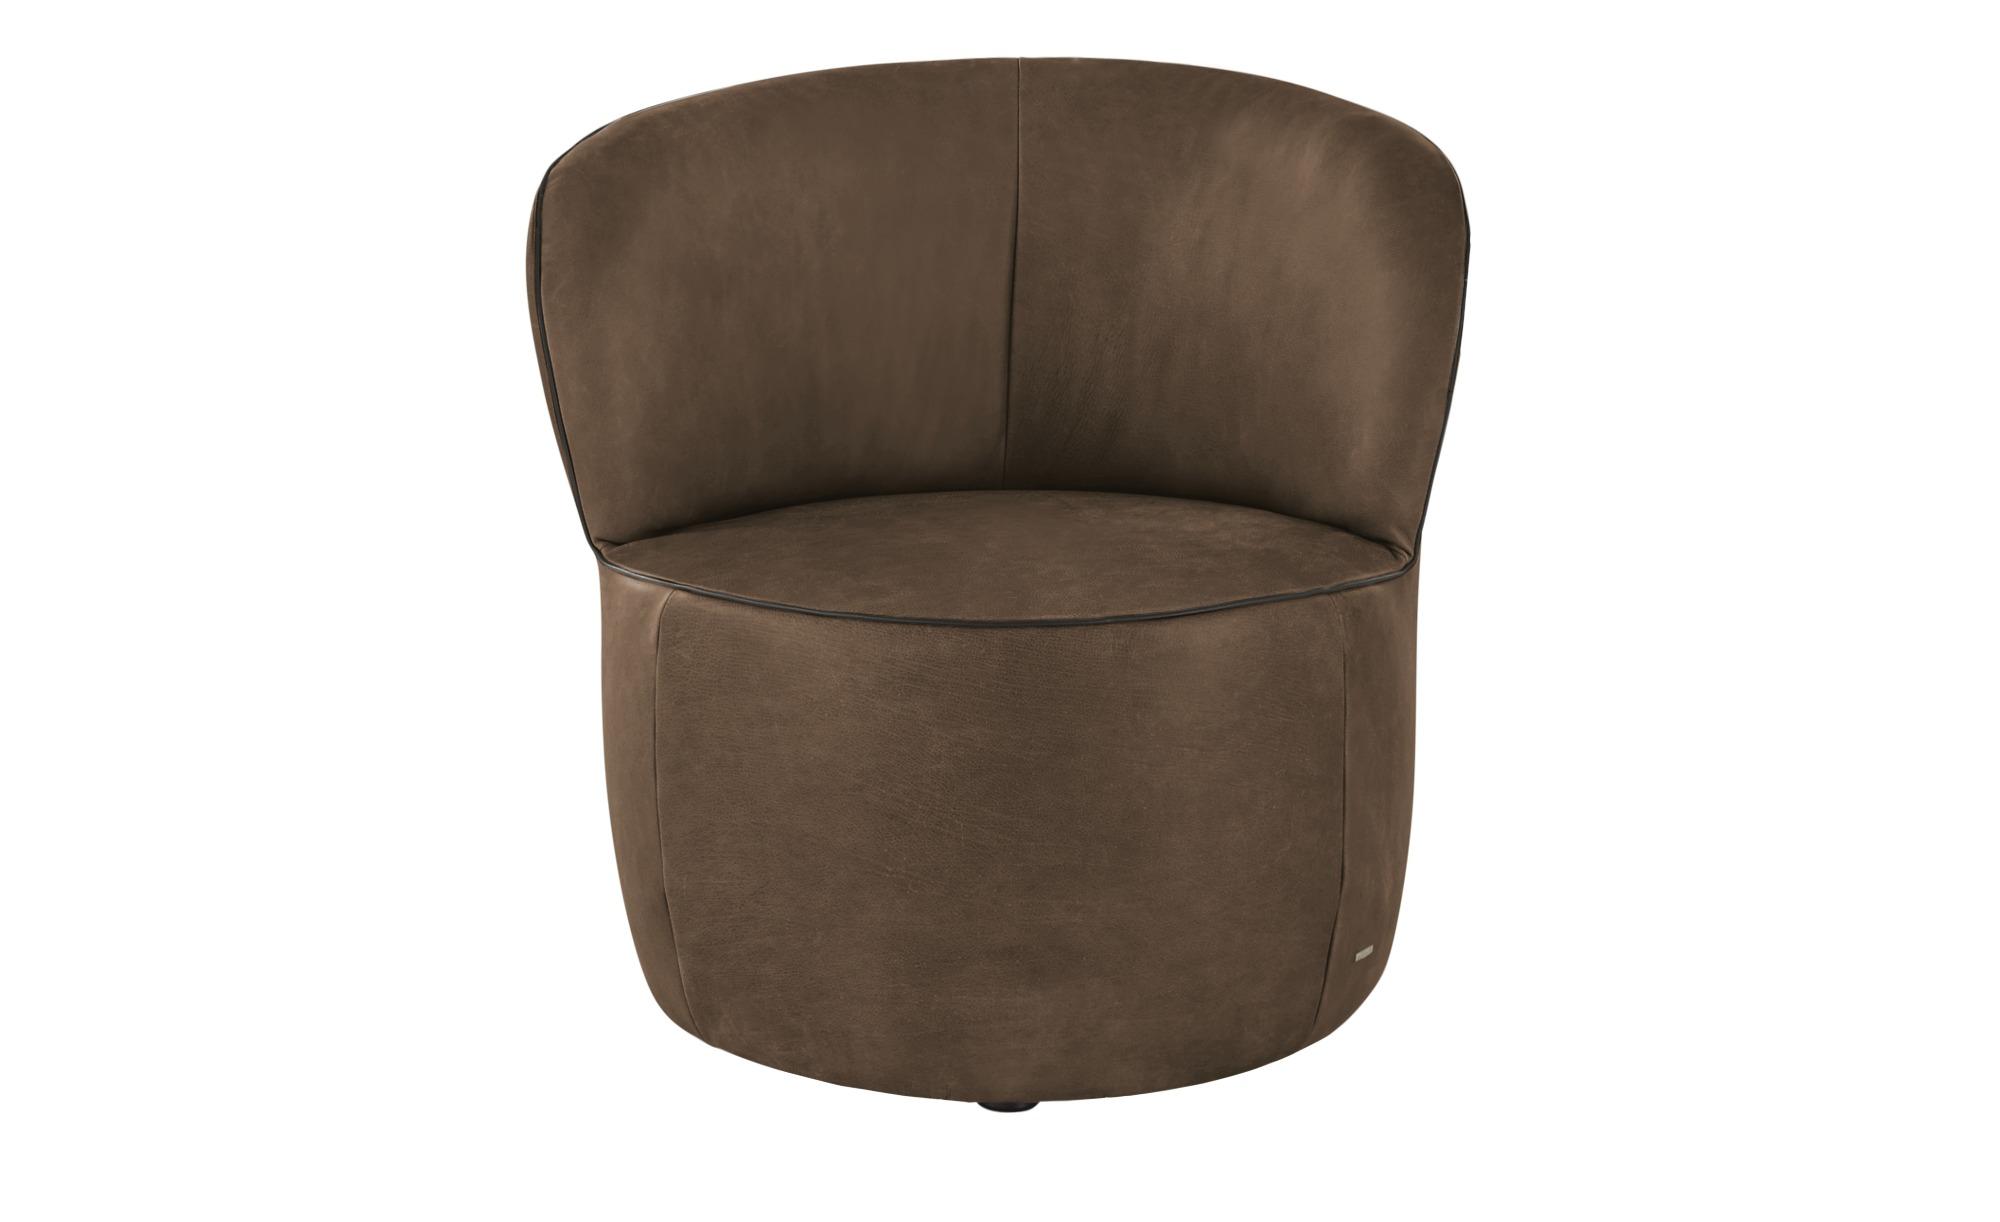 KOINOR Sessel  Igor ¦ braun ¦ Maße (cm): B: 73 H: 70 T: 72 Polstermöbel > Sessel > Ledersessel - Höffner